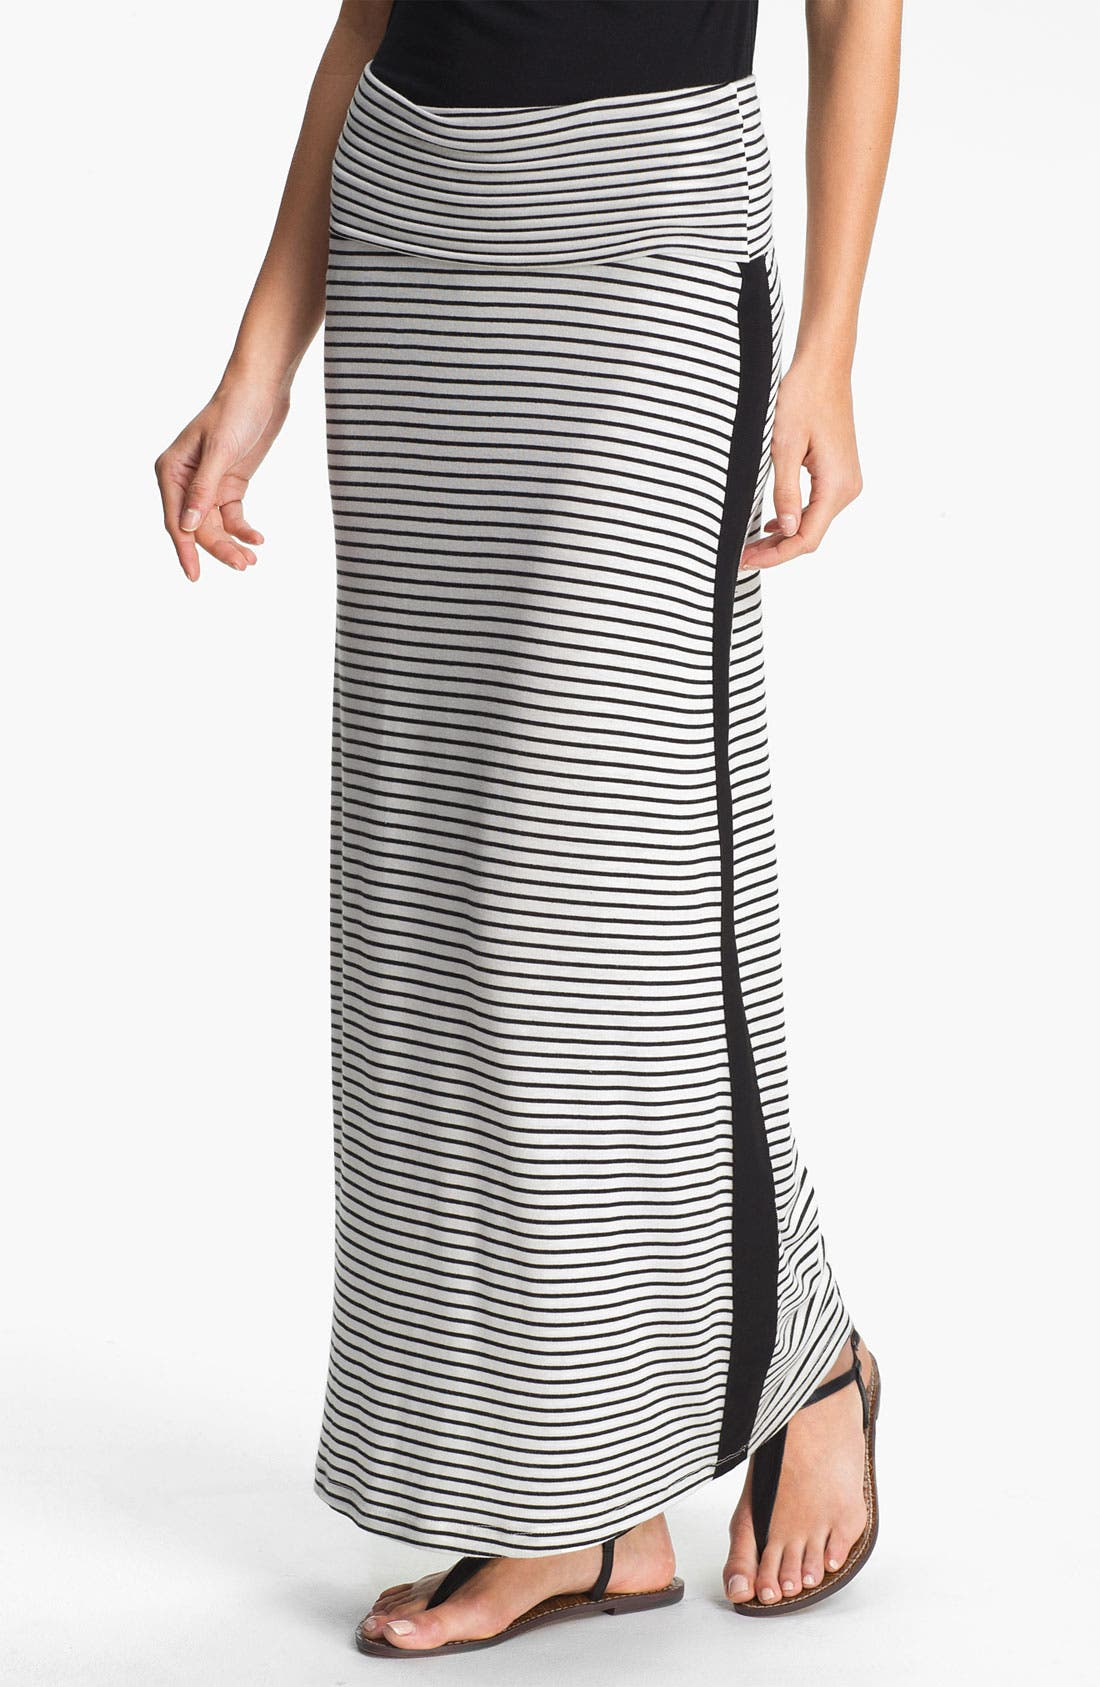 Main Image - Everleigh Tuxedo Stripe Maxi Skirt